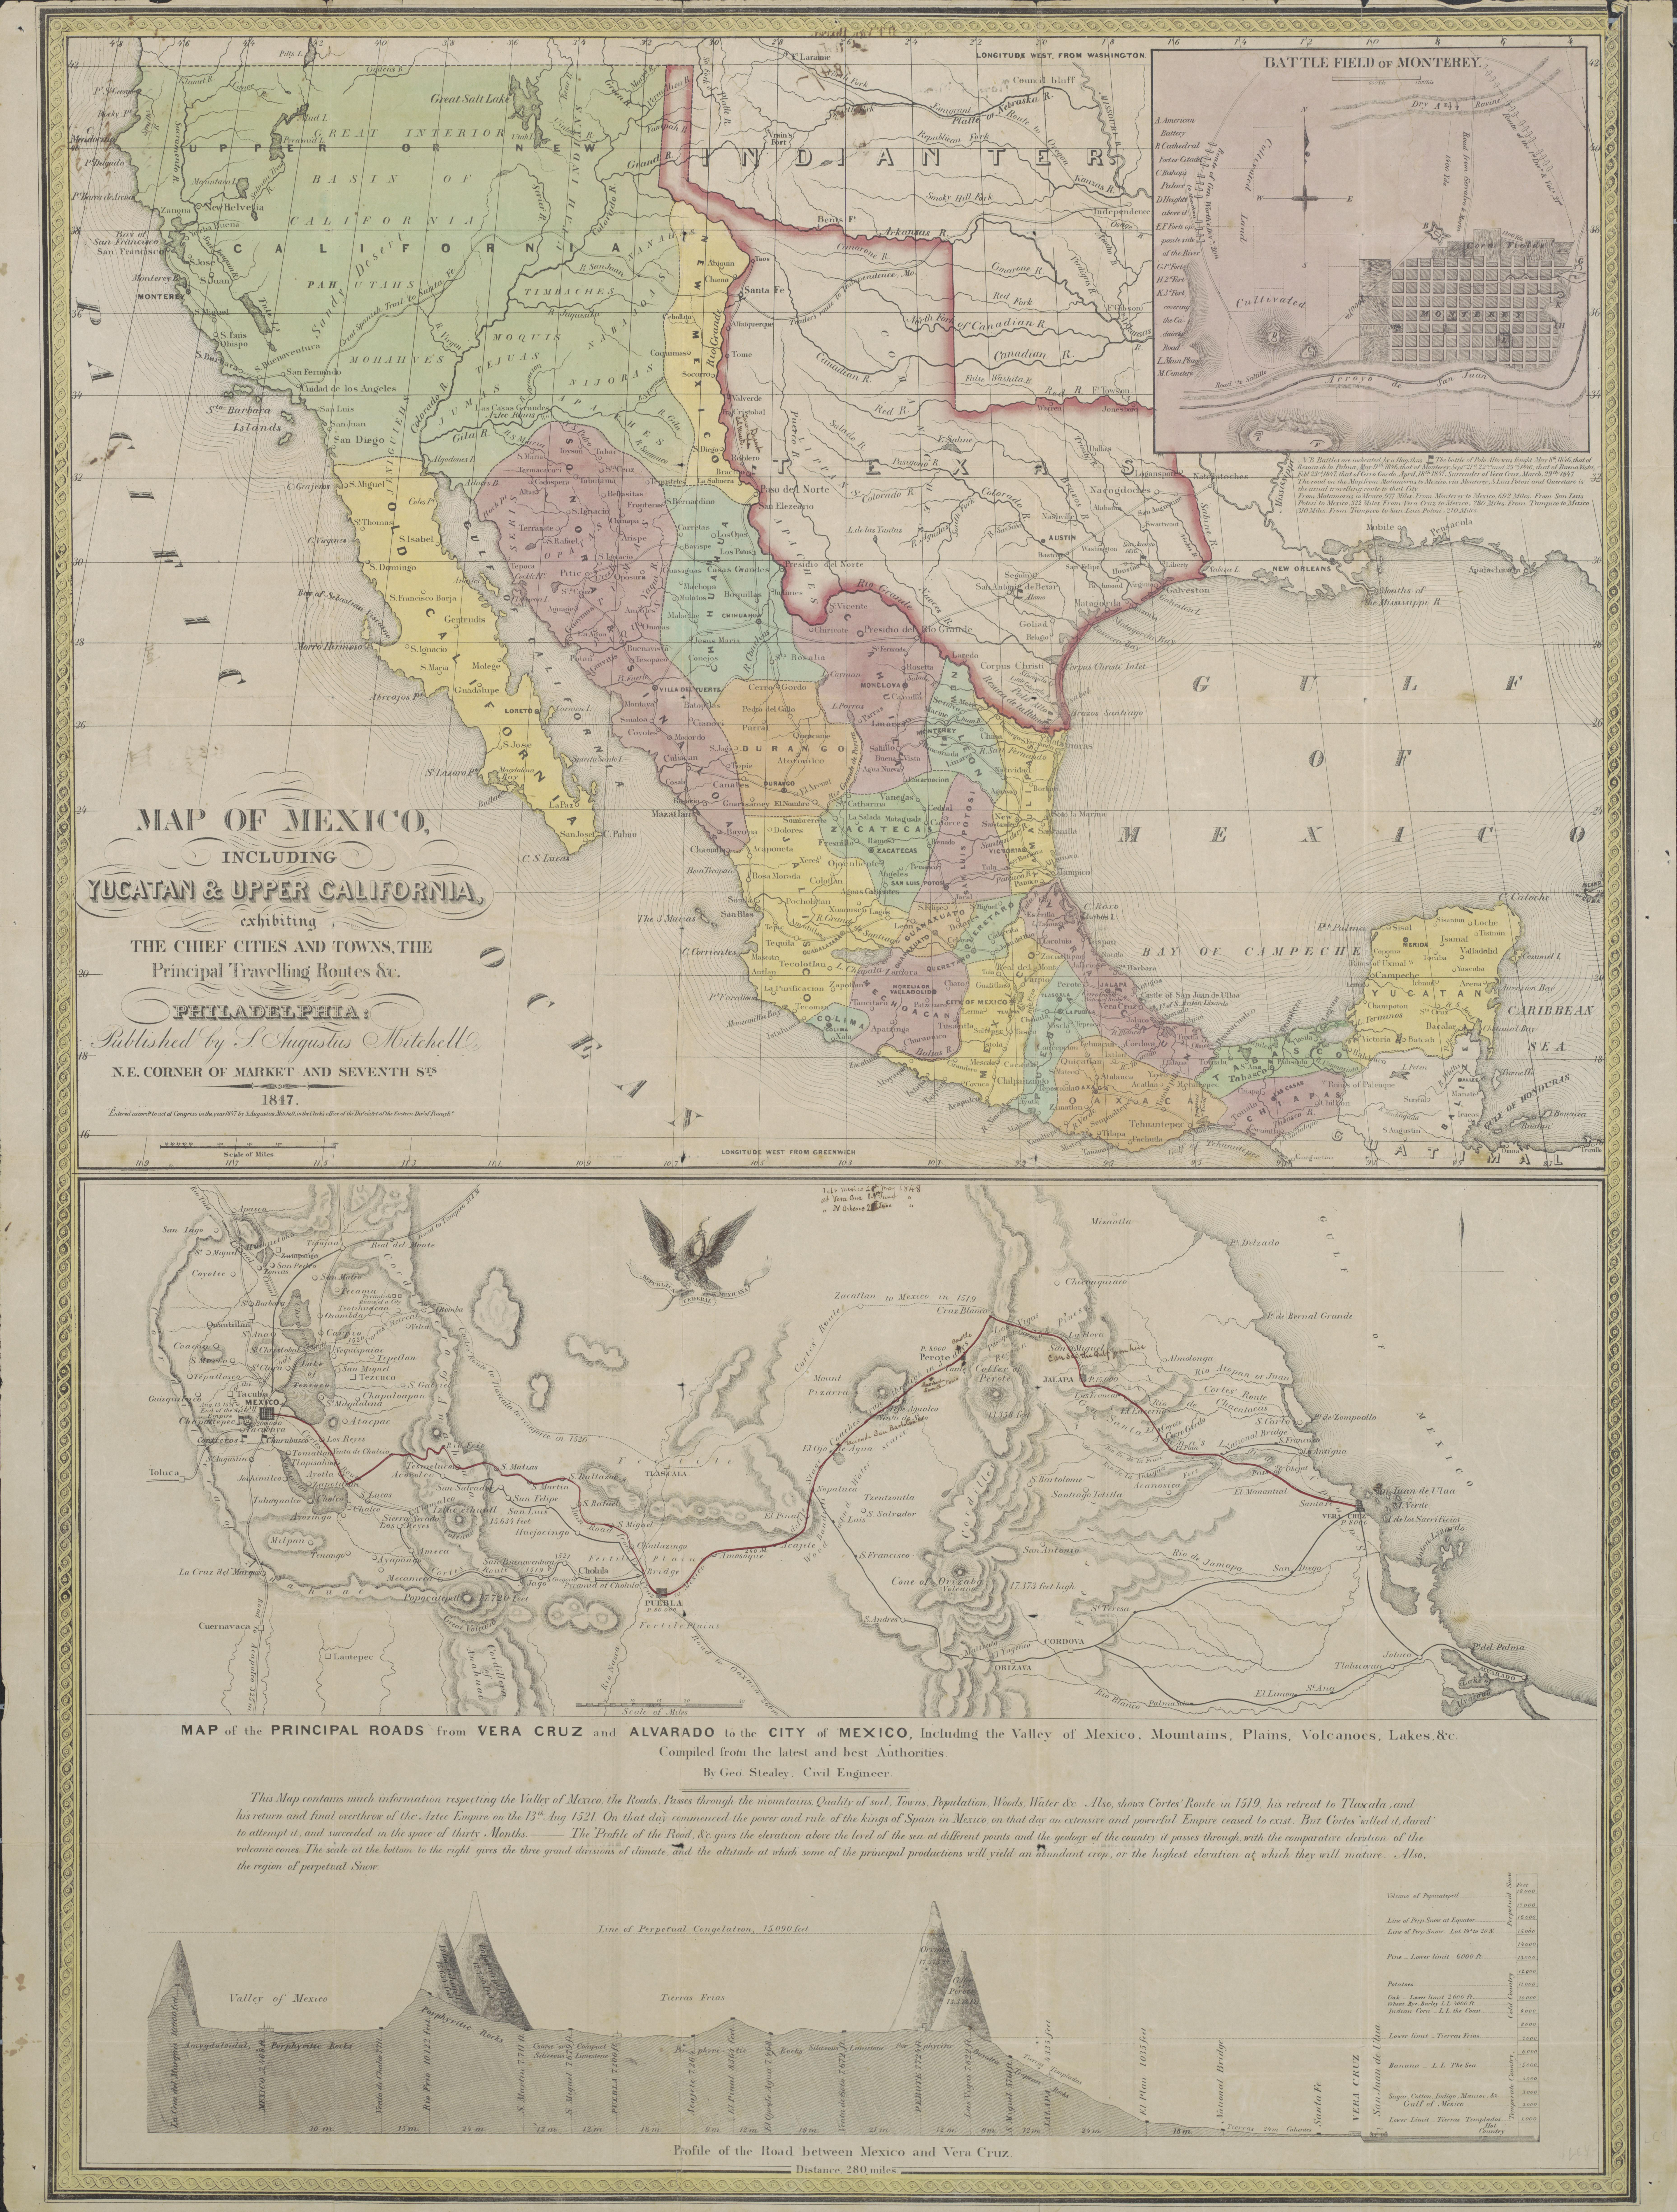 Maps: Map of Mexico, including Yucatan & Upper California ...